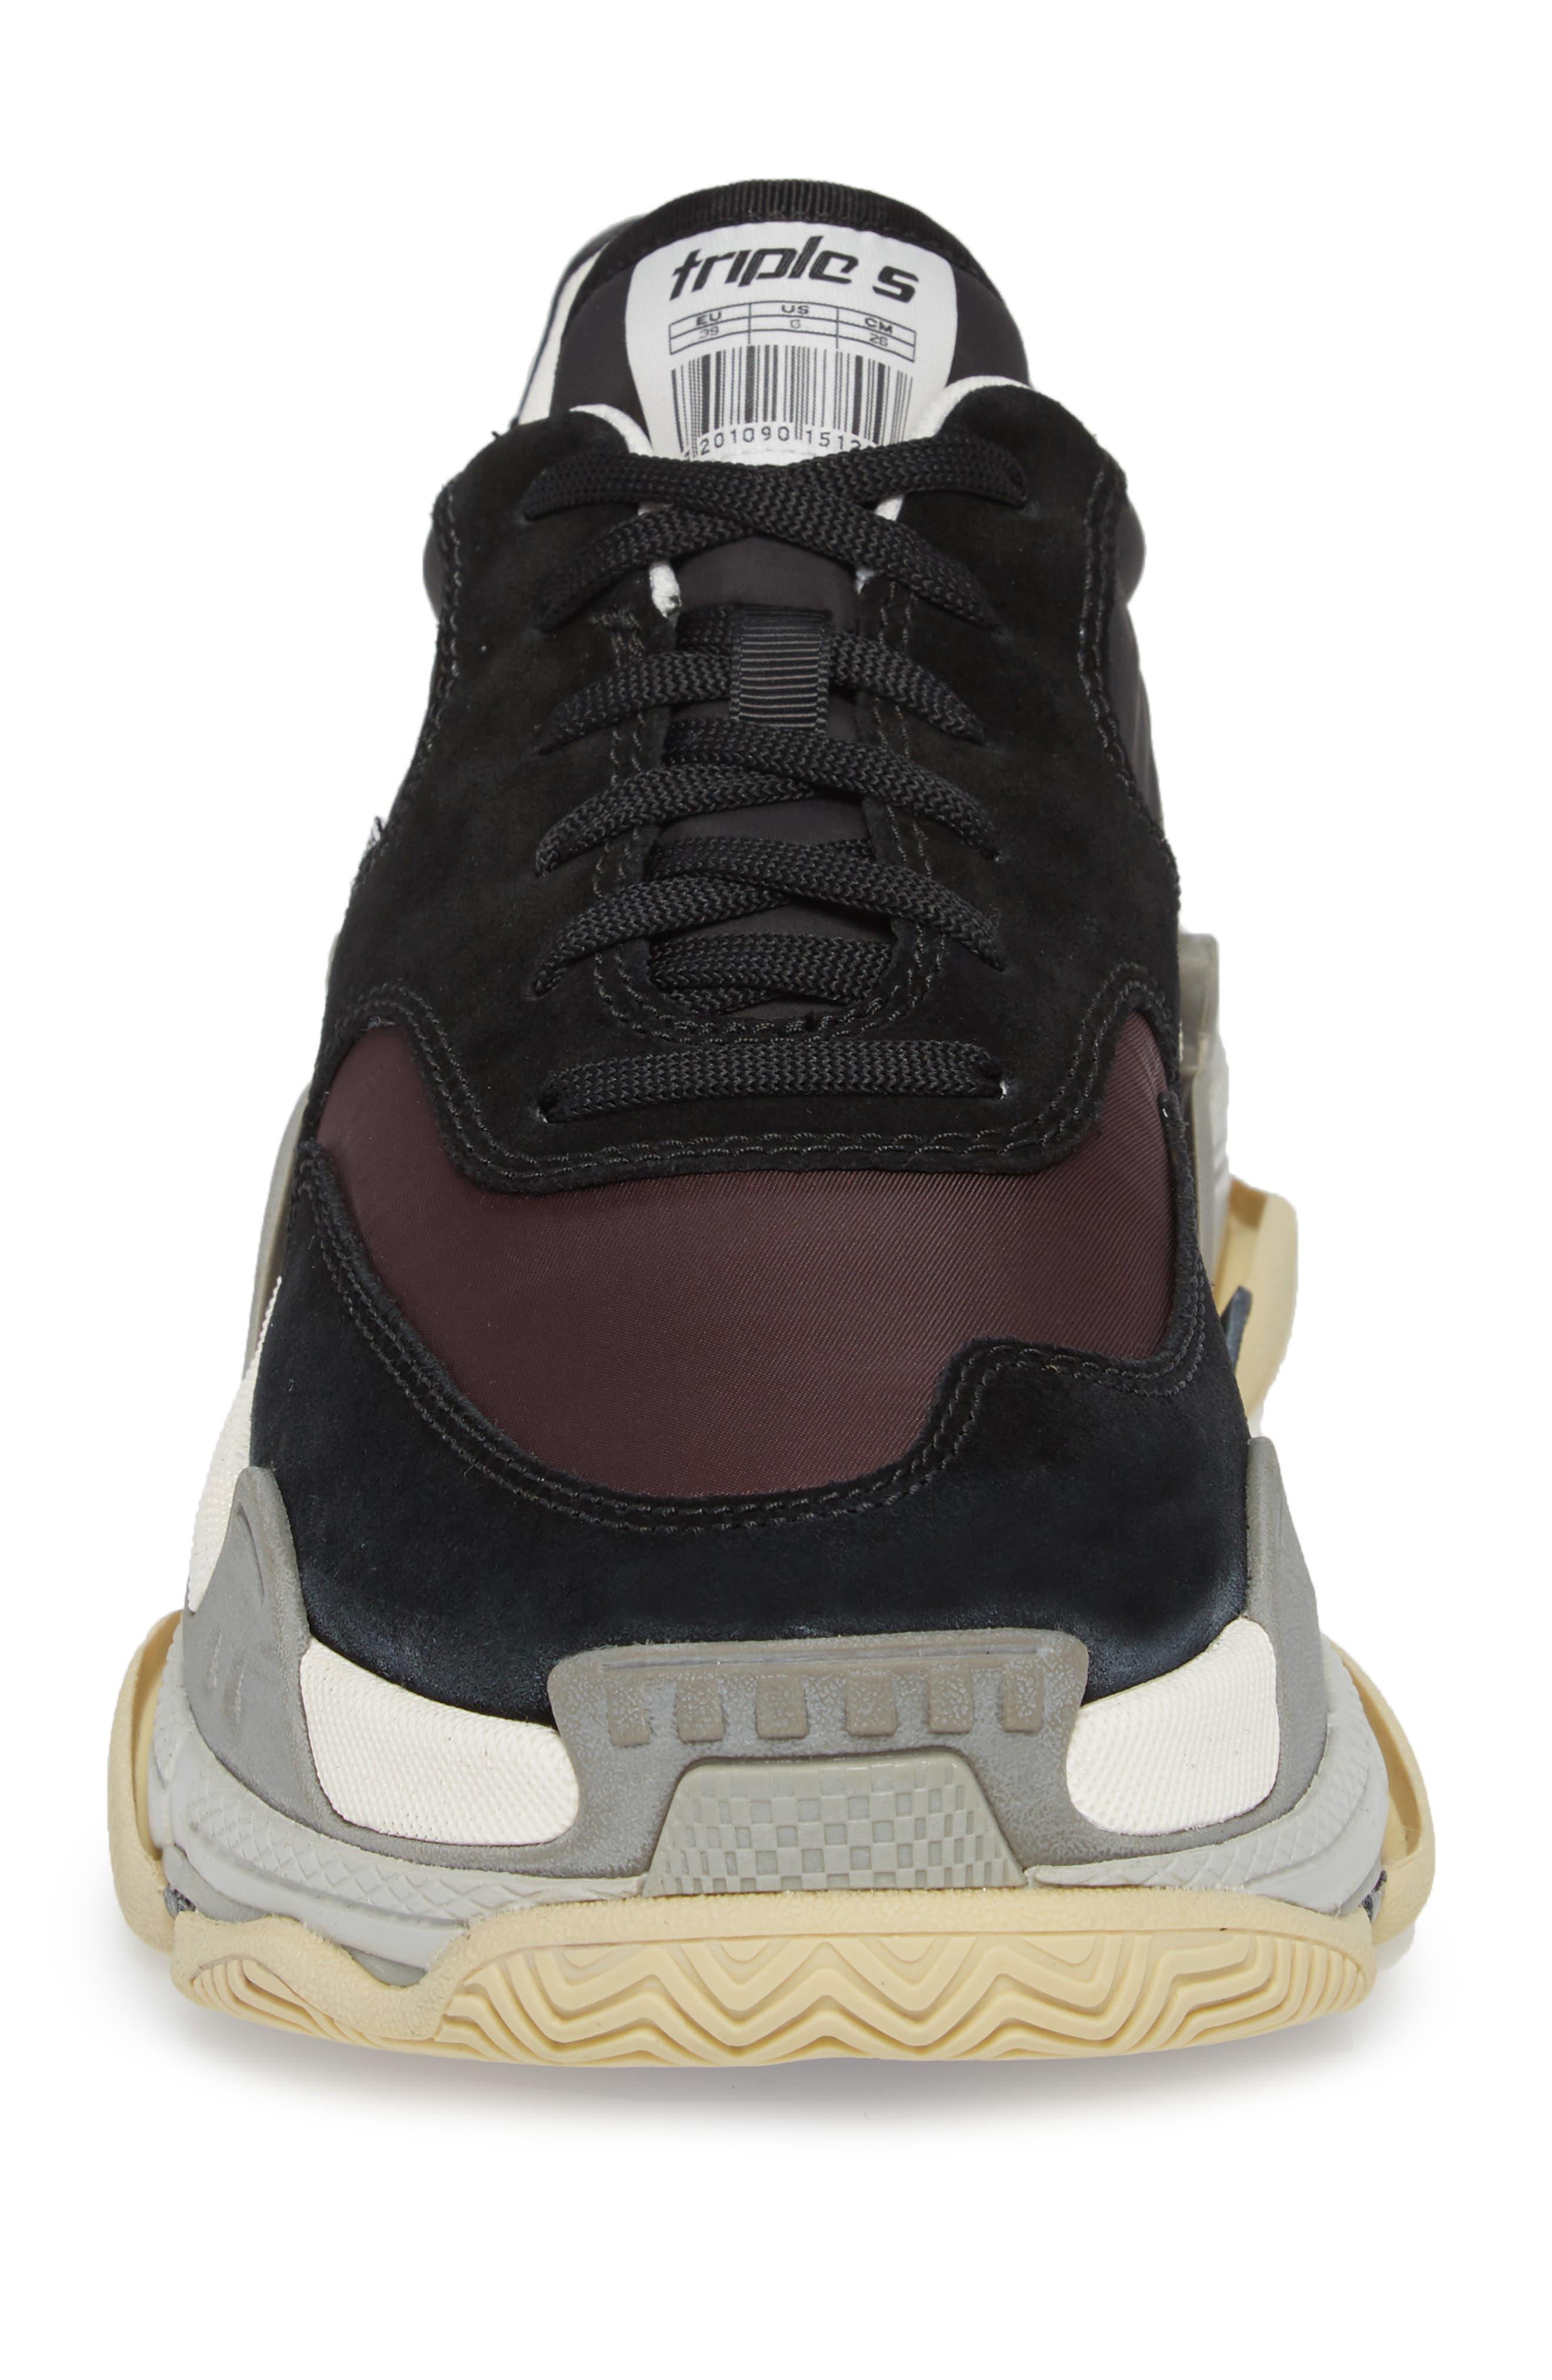 Triple S Retro Sneaker,                             Alternate thumbnail 4, color,                             Black/ Bordeaux